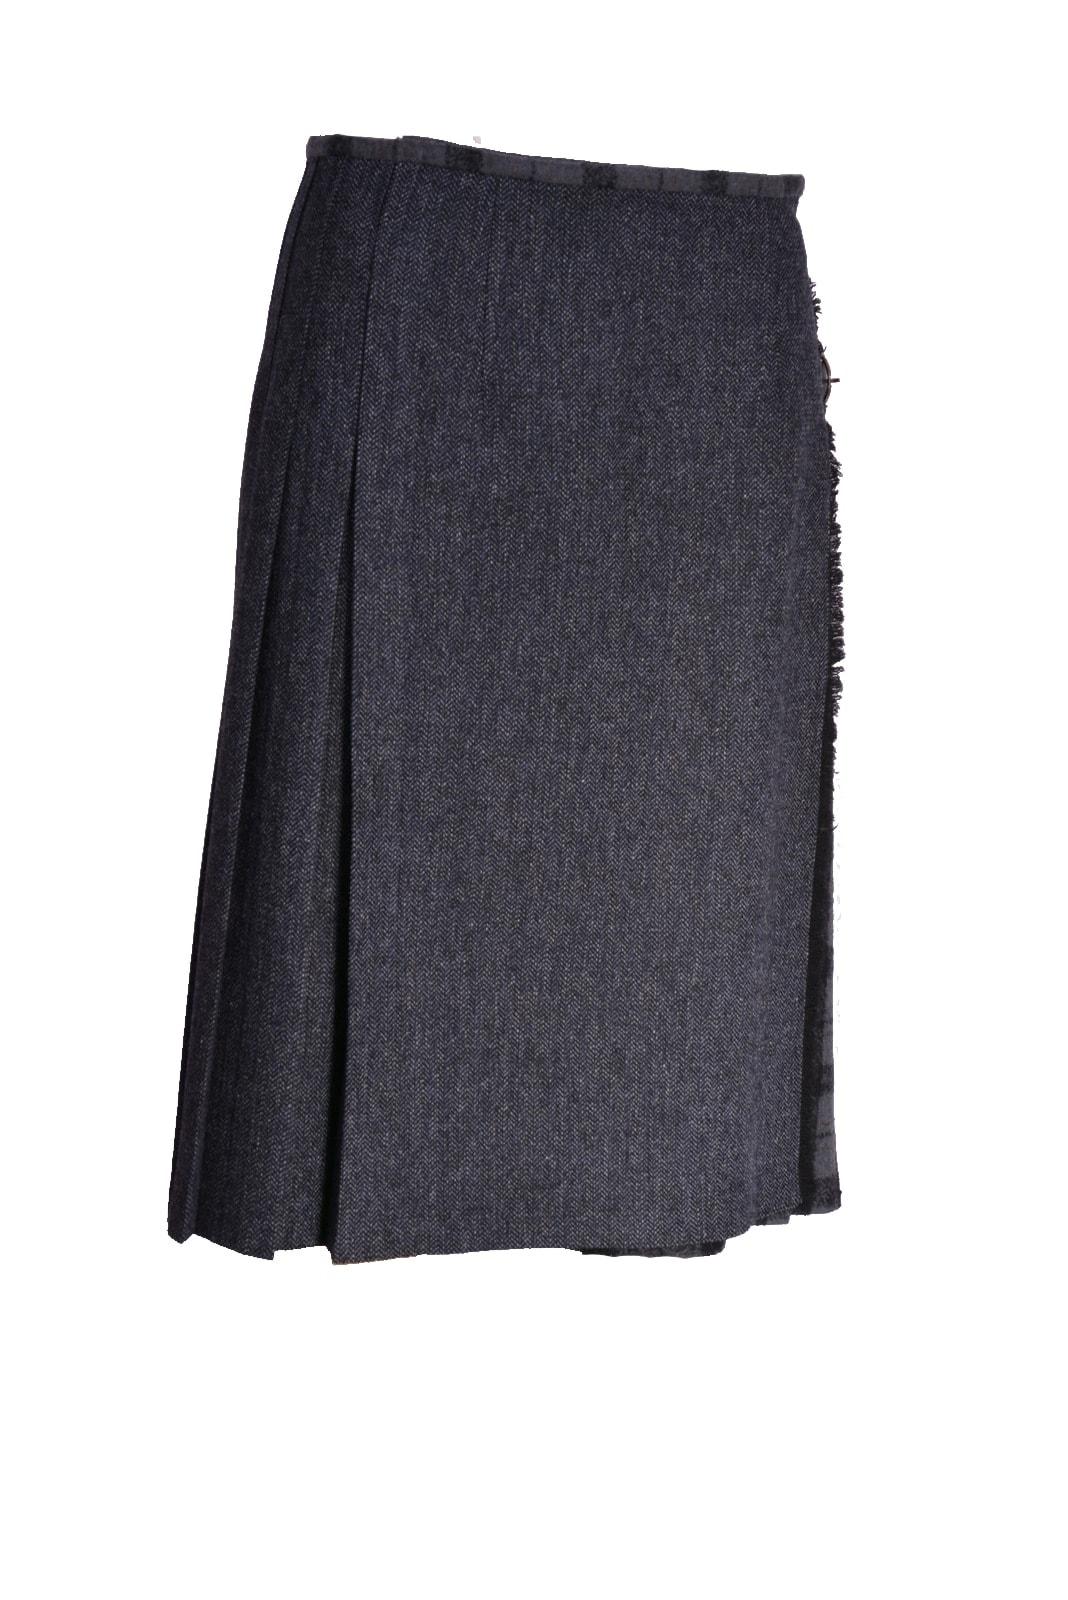 pleated-wraped-skirt-knee_f285242e299e539748dac0eecfb88196